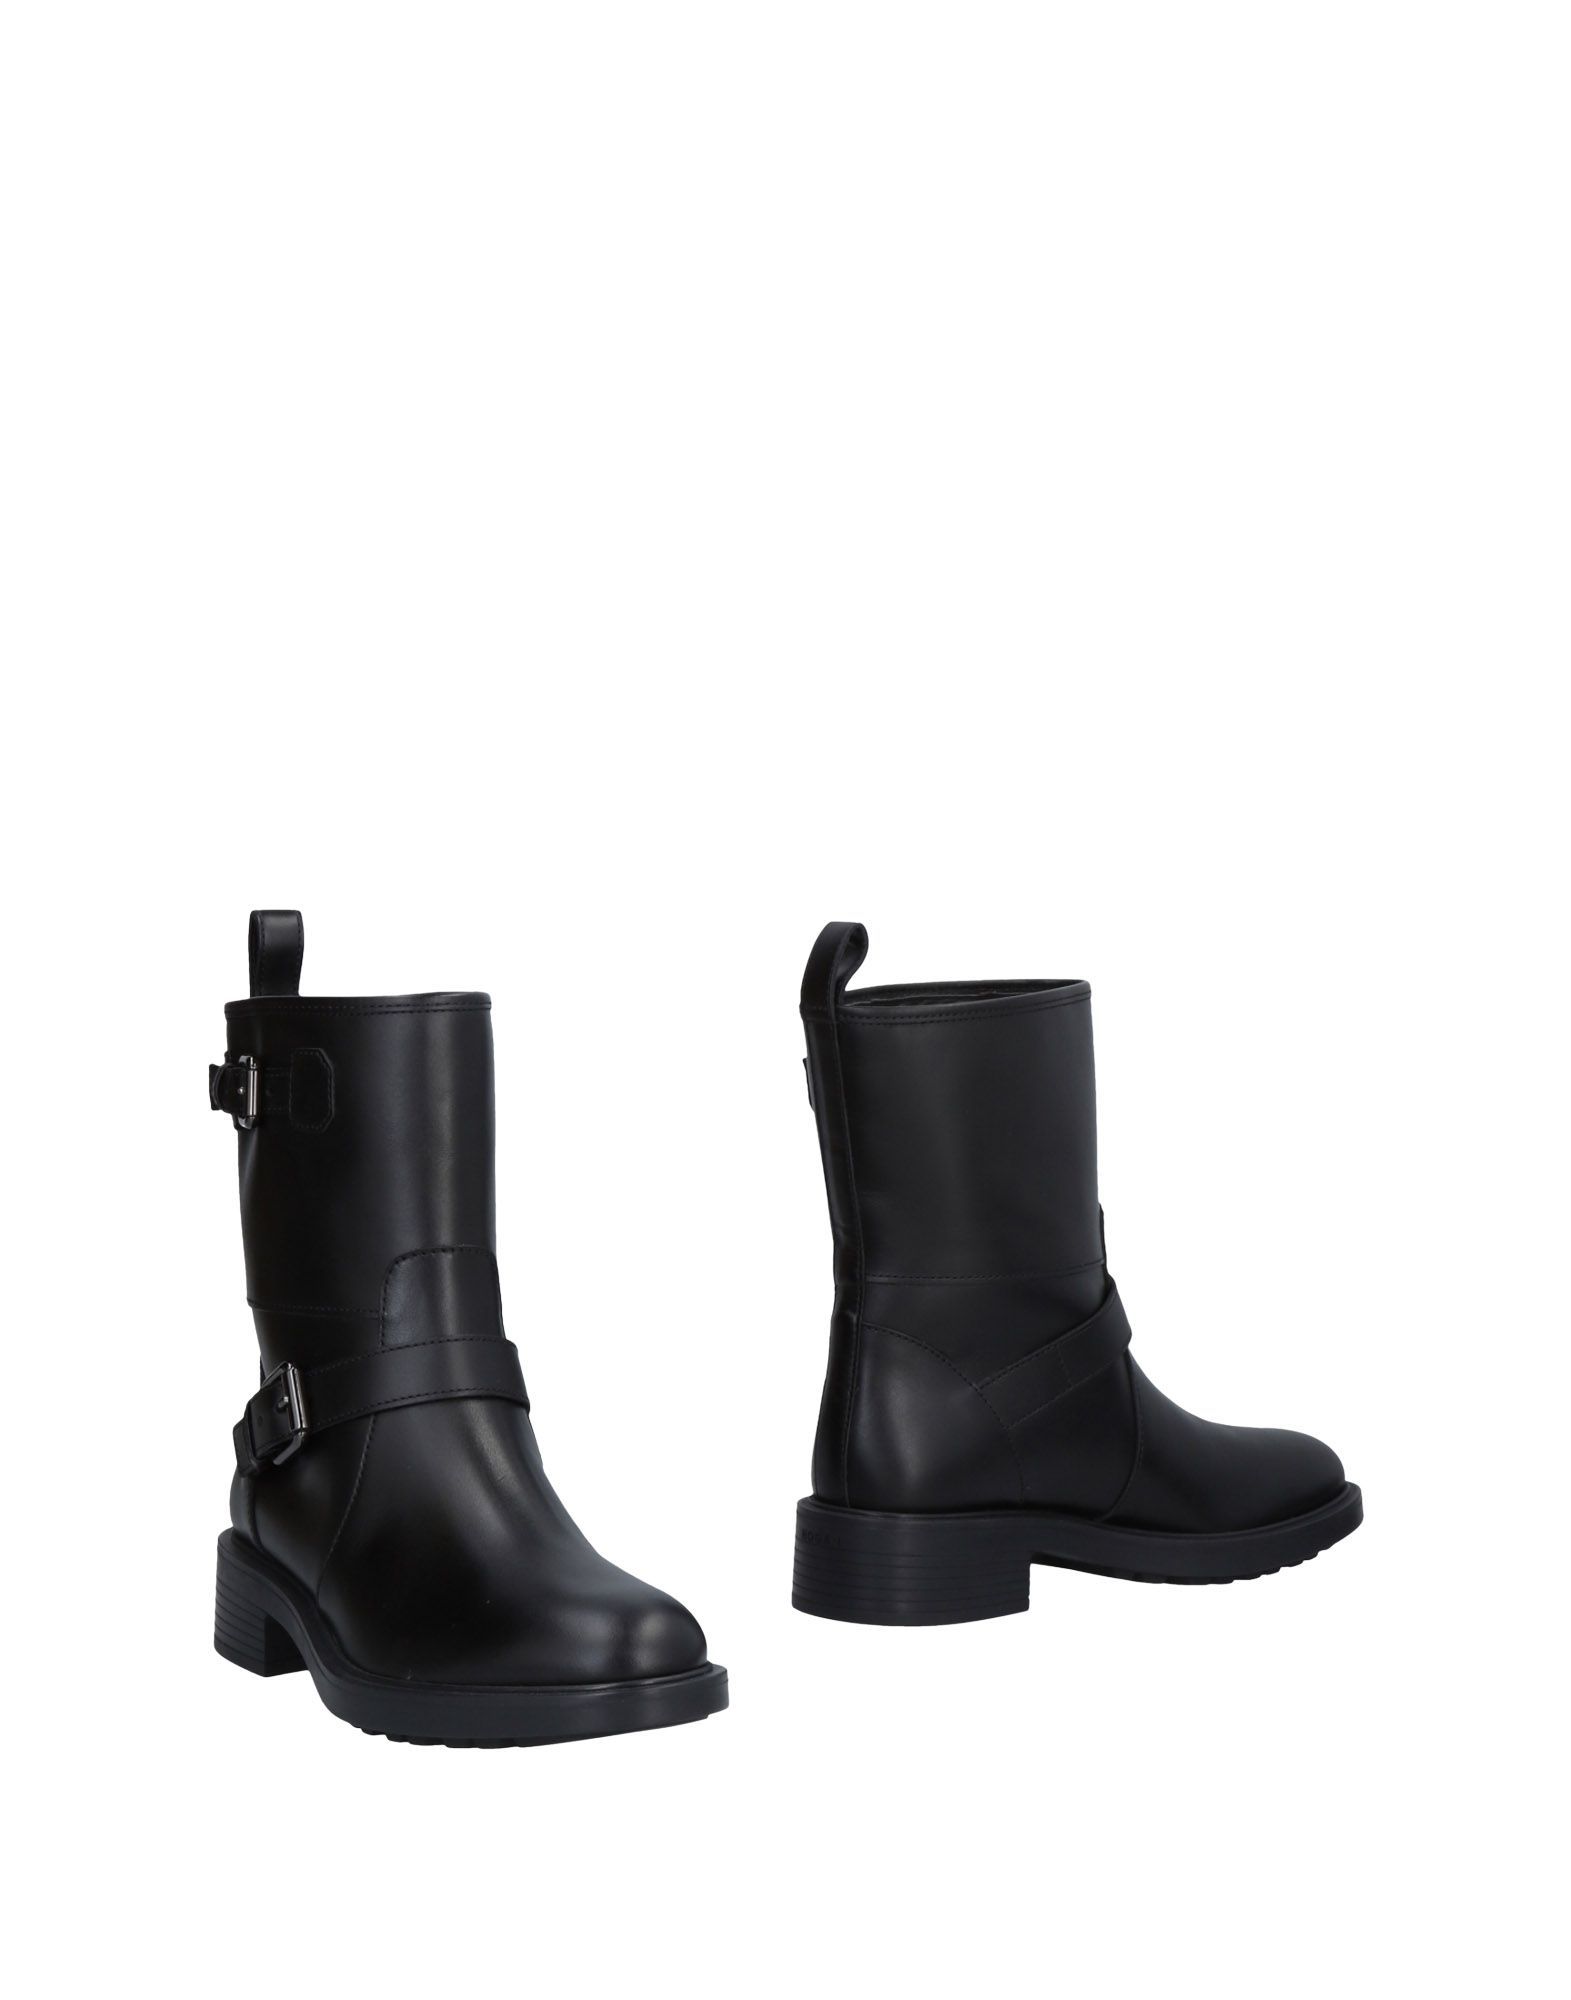 HOGAN Полусапоги и высокие ботинки hogan by karl lagerfeld полусапоги и высокие ботинки